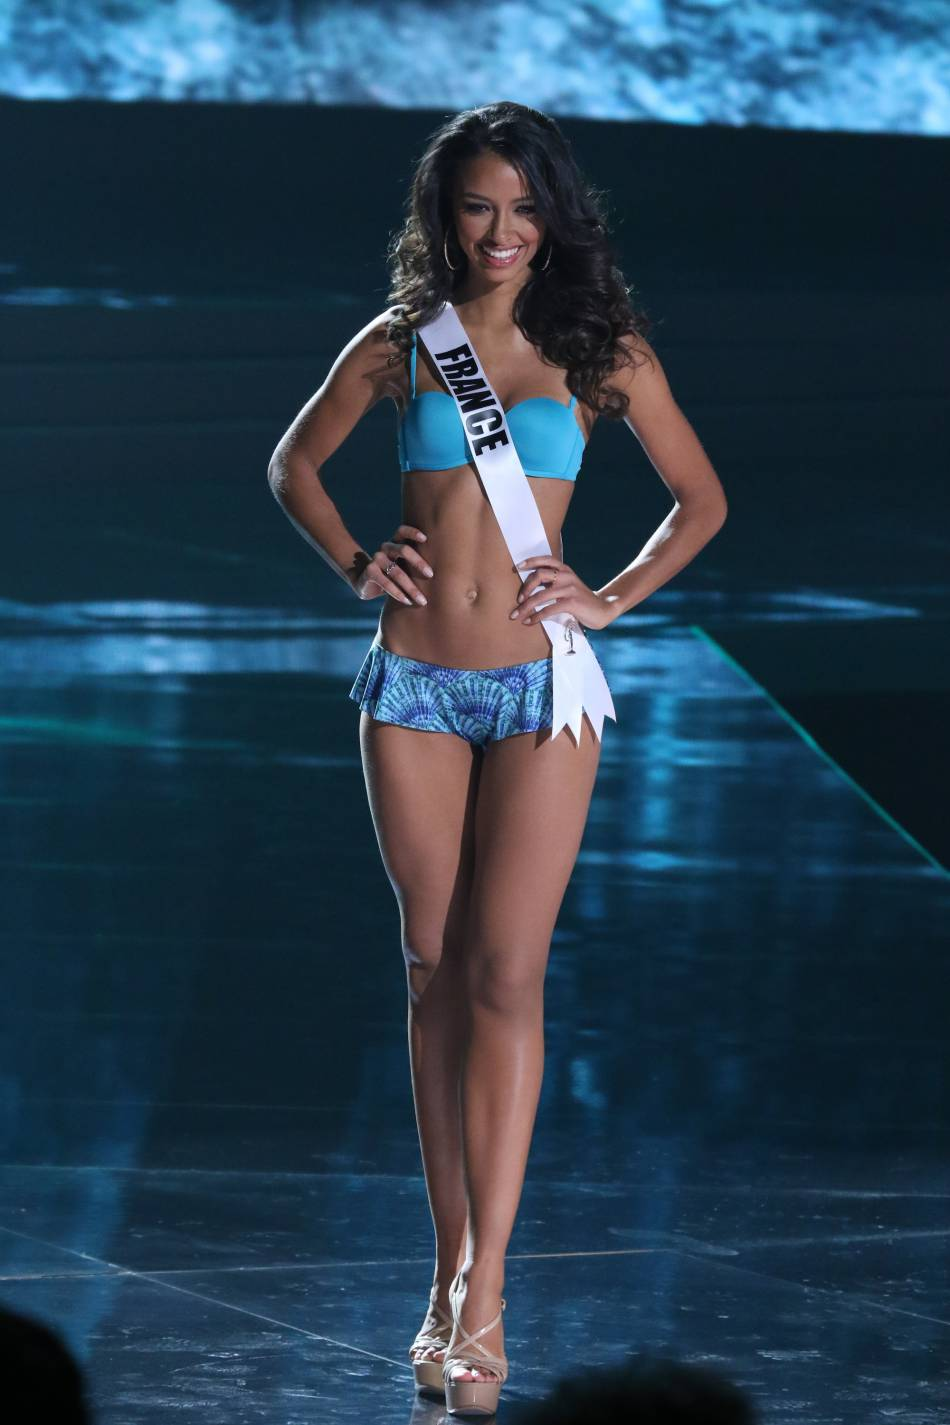 Sera-t-elle la prochaine Miss Univers?